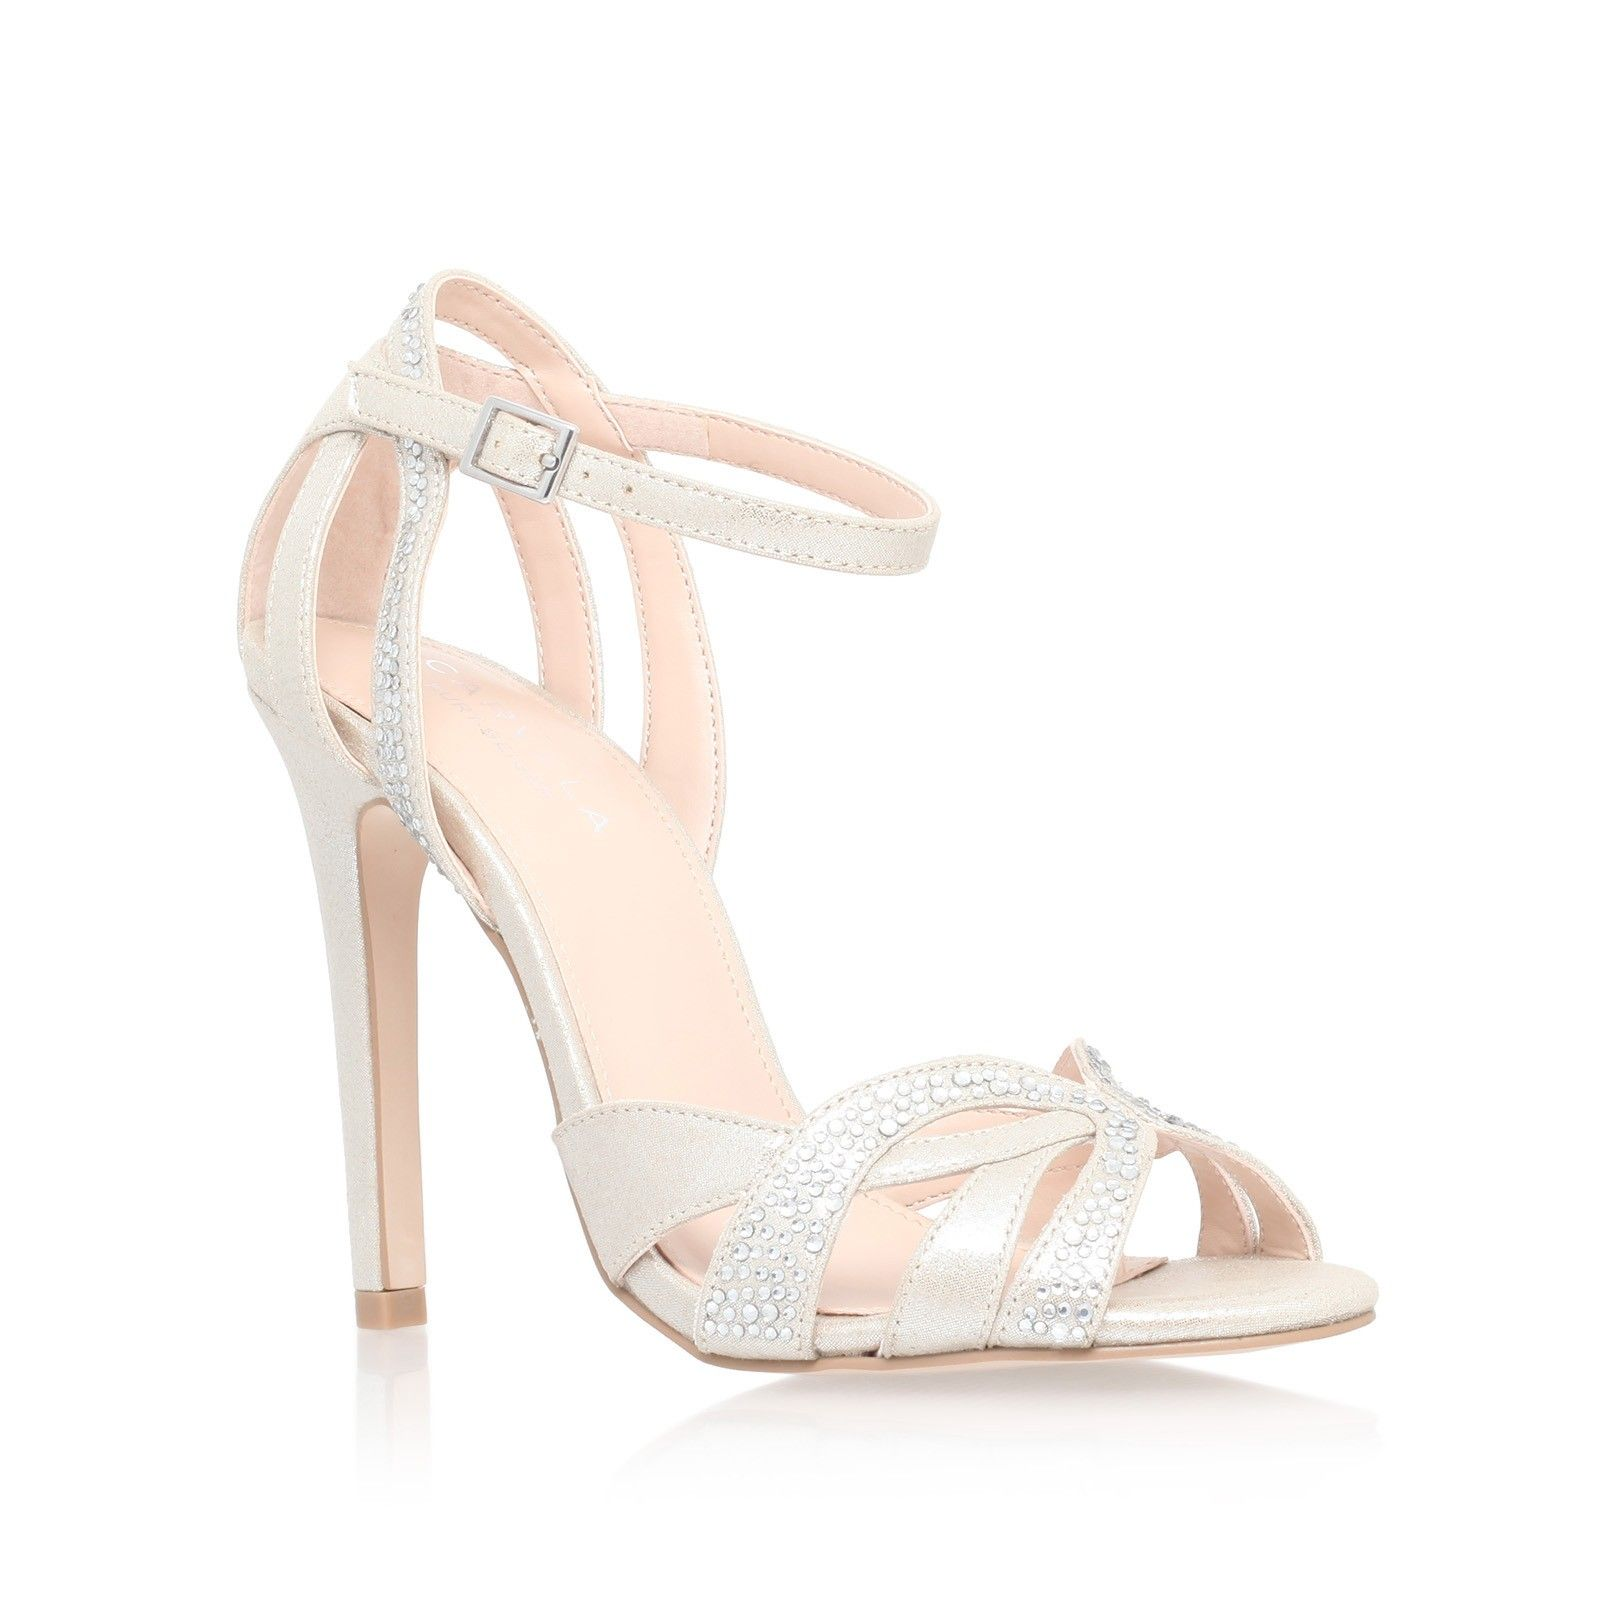 Black sandals debenhams - Lana Silver High Heel Sandals From Carvela Kurt Geiger